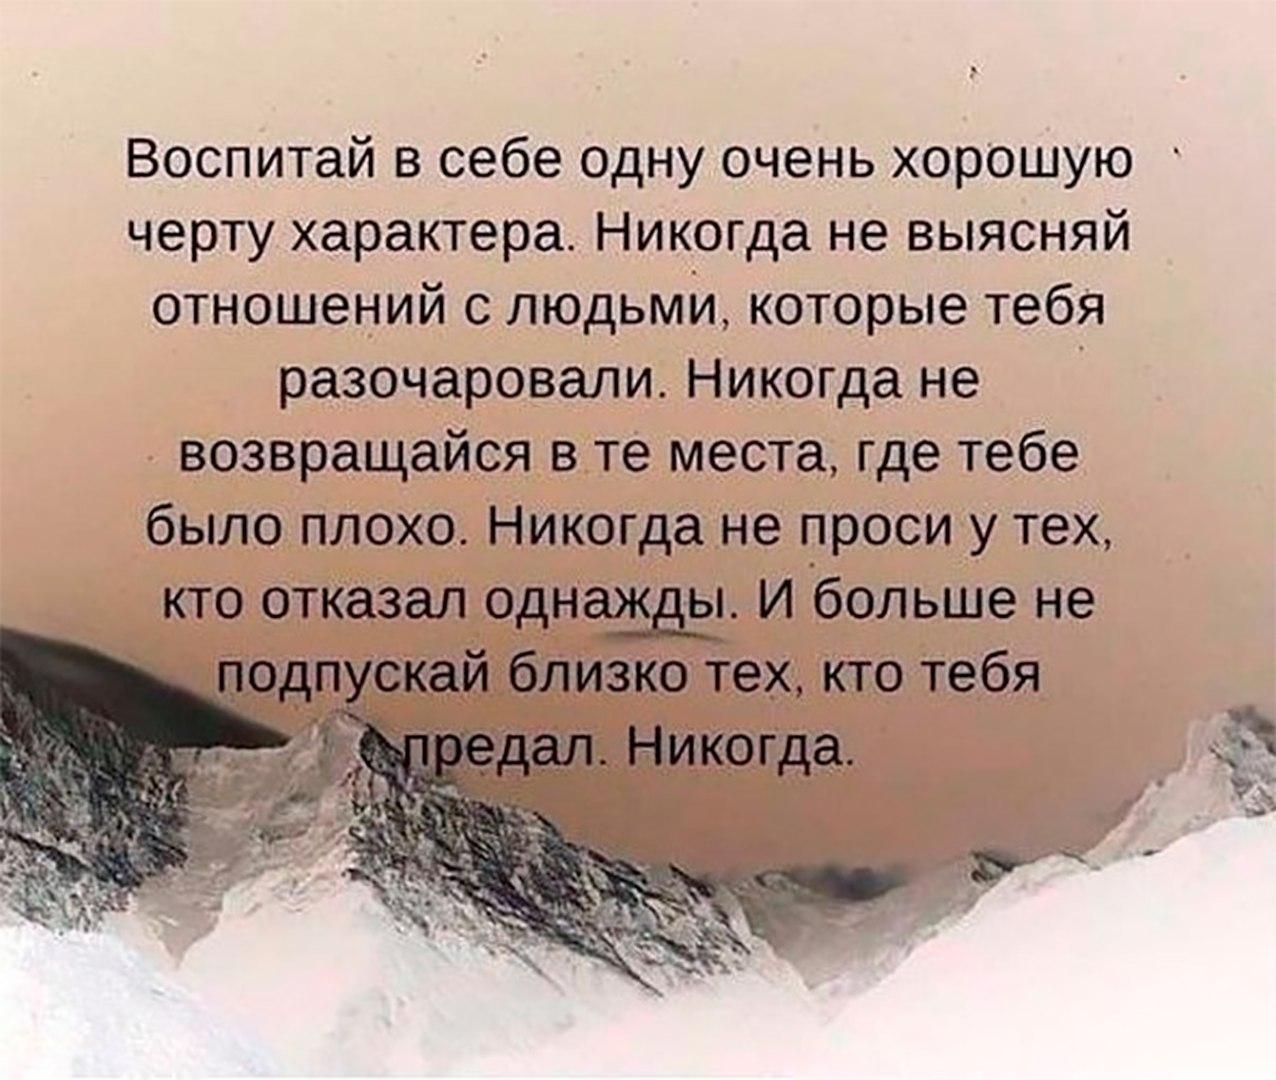 https://pp.userapi.com/c847020/v847020426/114c4f/czZ_y2YoLQs.jpg